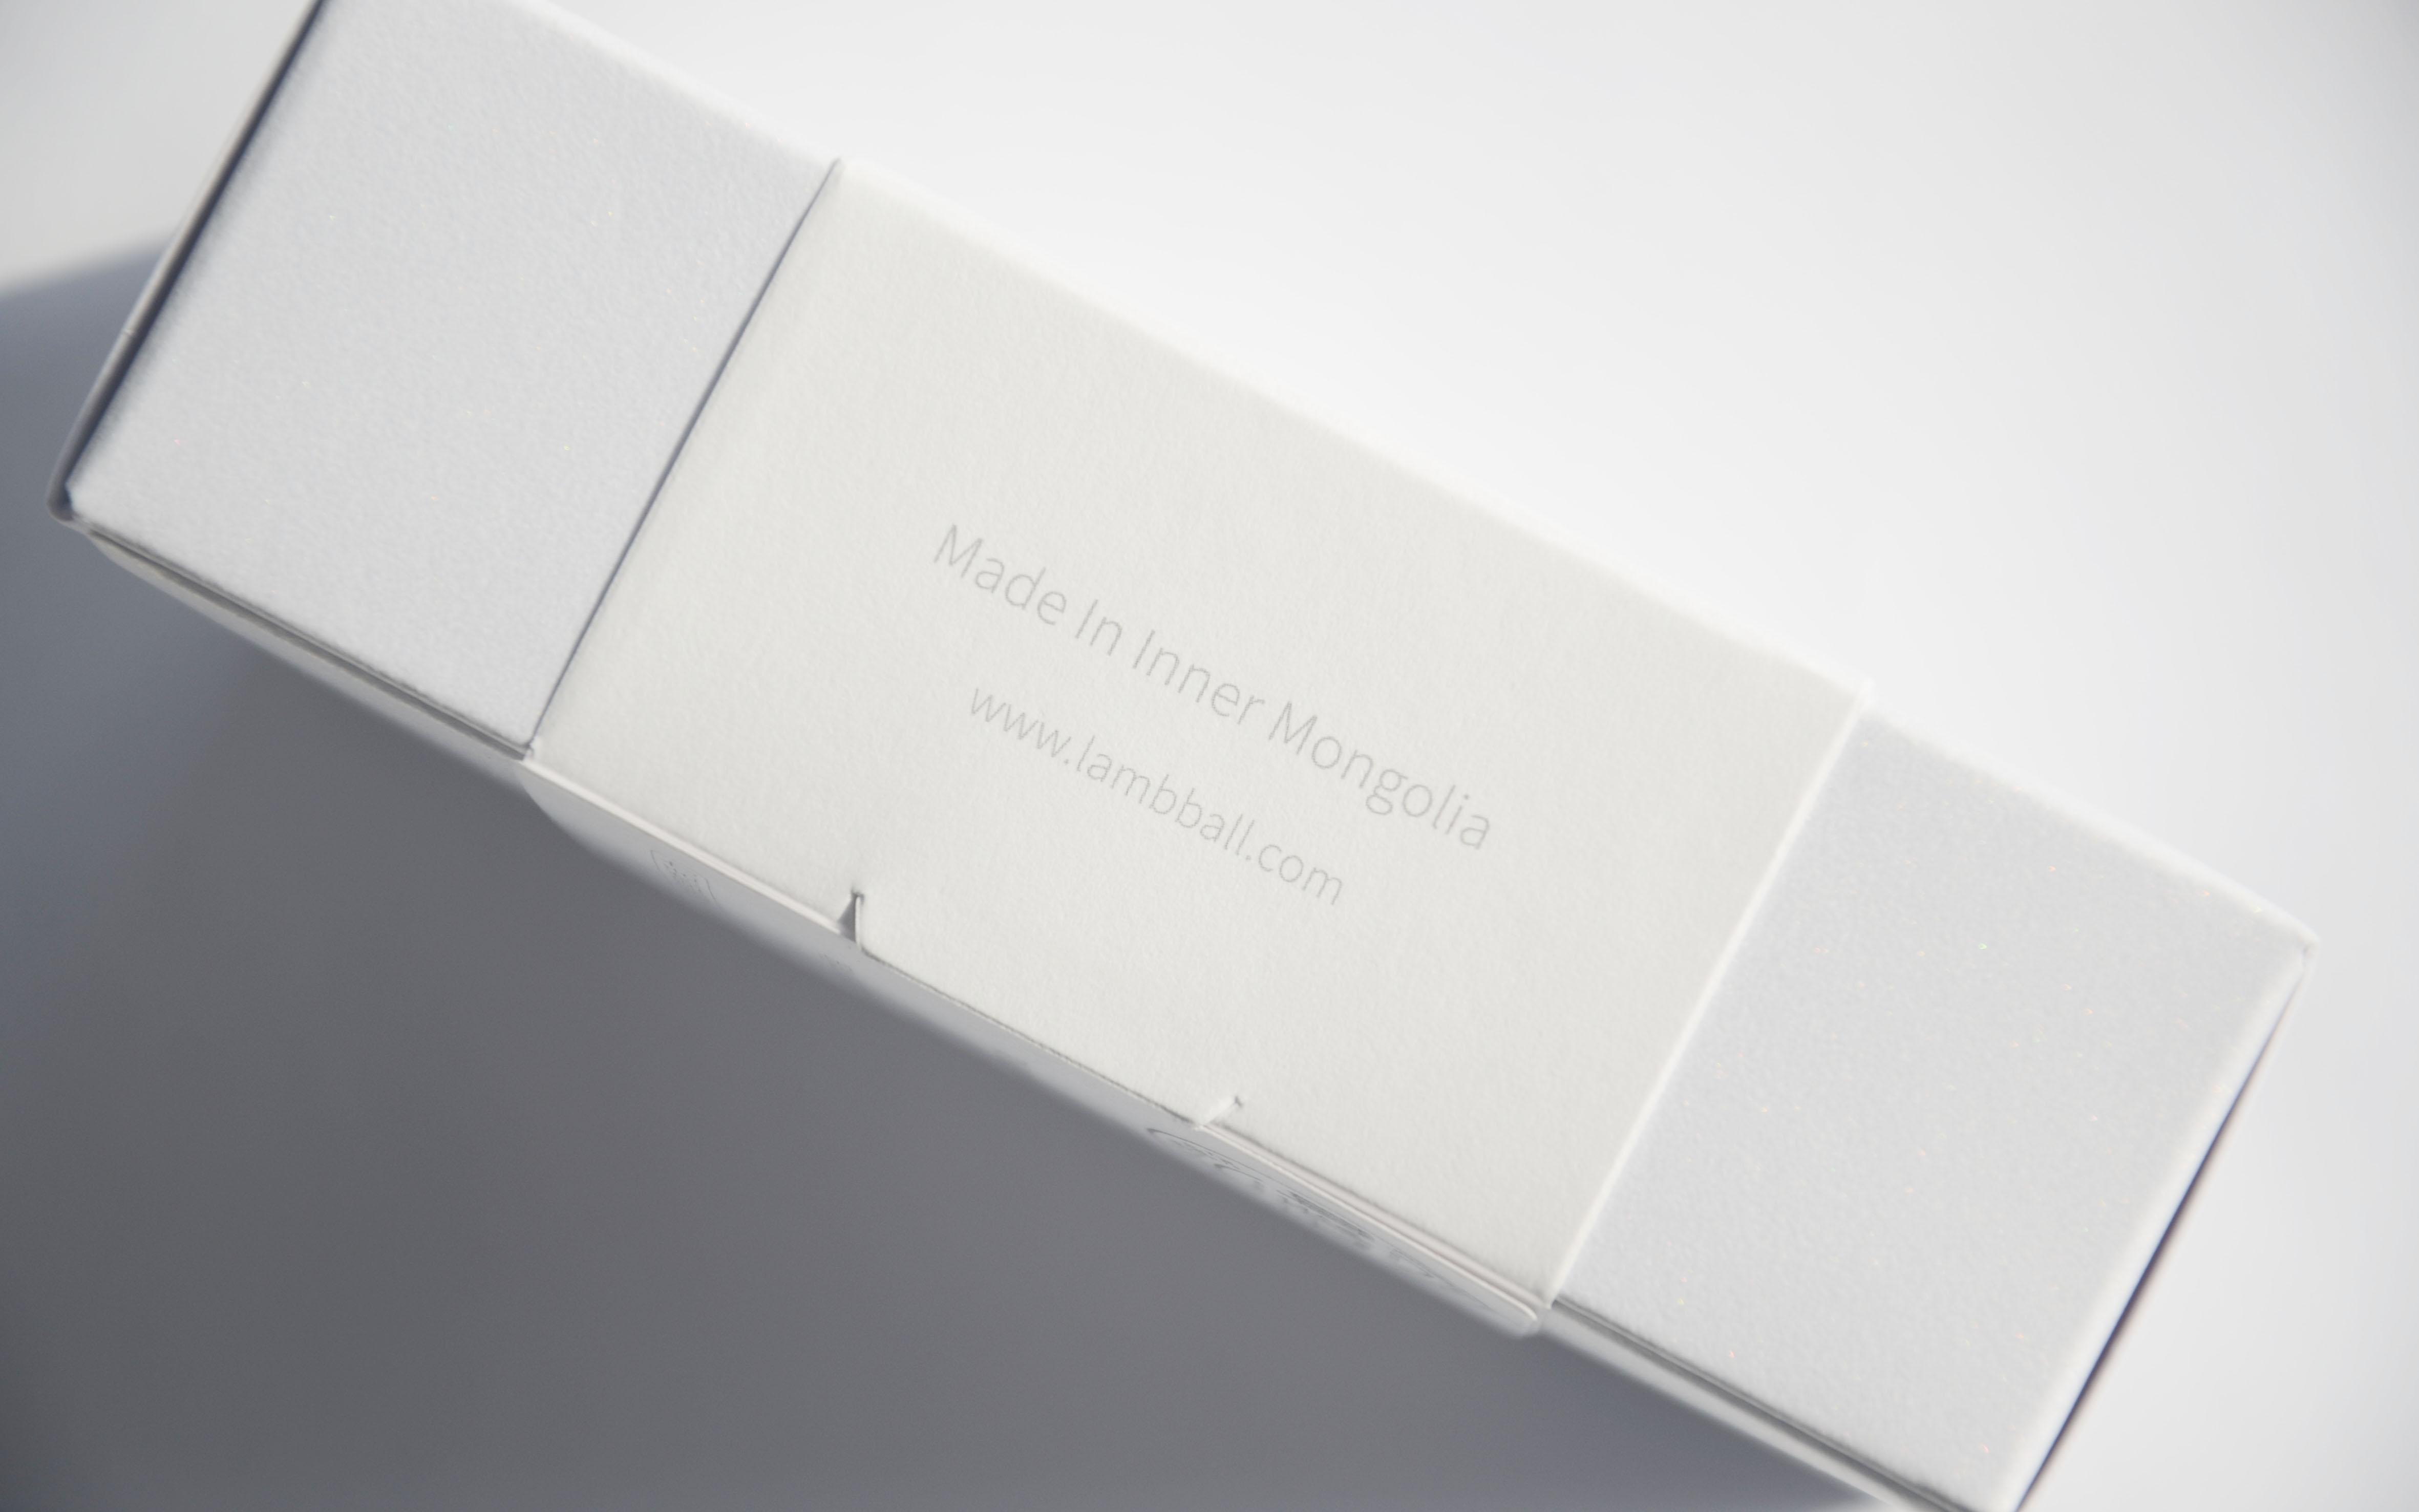 lambball羊脂皂包装设计 第17张 lambball羊脂皂包装设计 蒙古设计